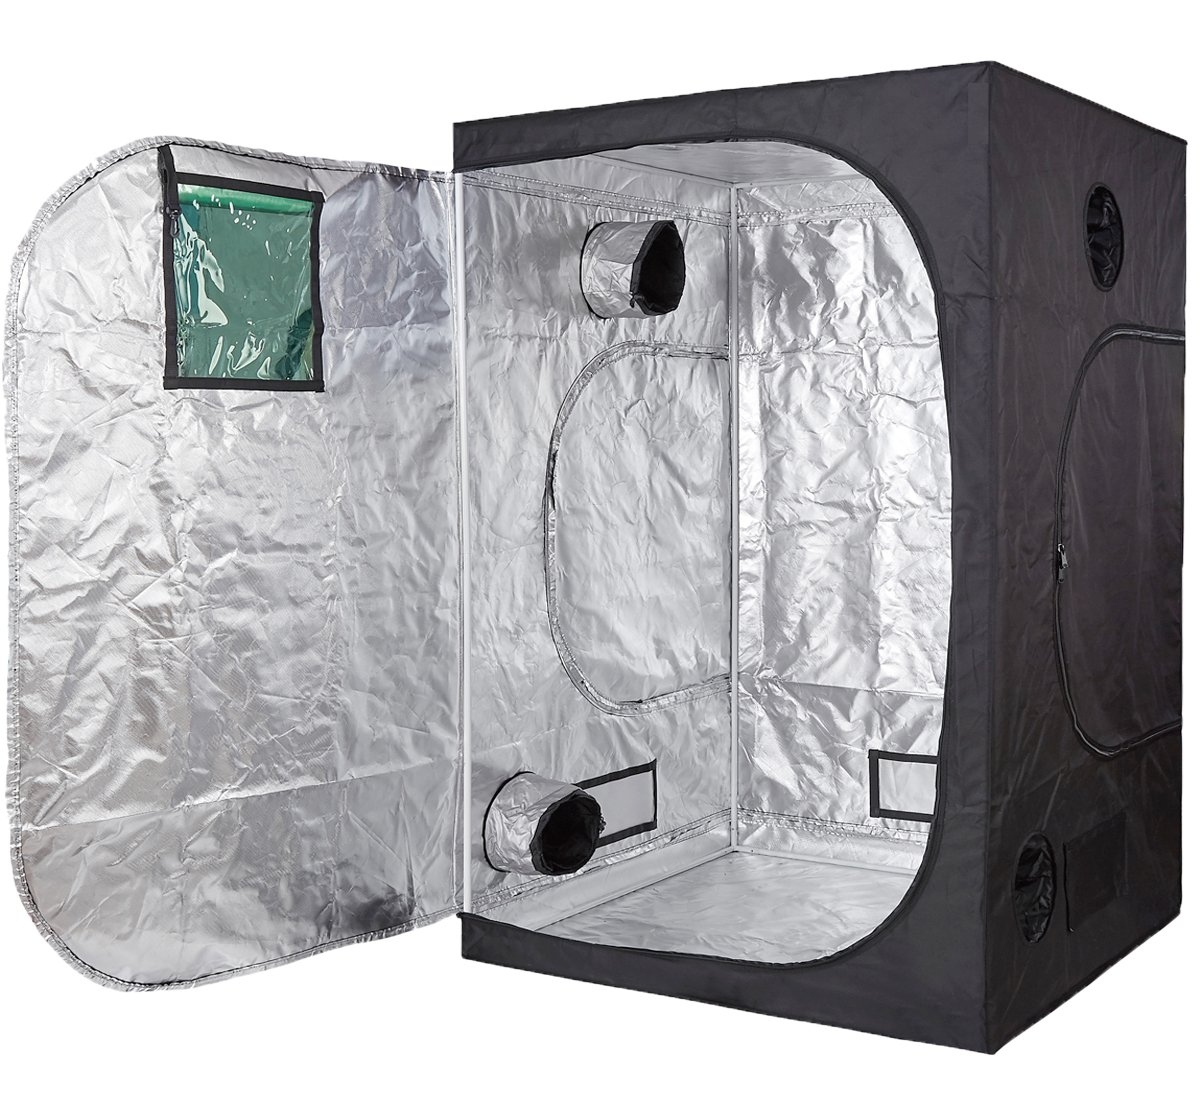 TopoLite 24''x24''x48'' 48''x24''x60'' 48''x48''x78'' 600D Grow Tent Room Reflective Mylar Indoor Garden Growing Room Hydroponic System (60''x60''x78'' w/window)